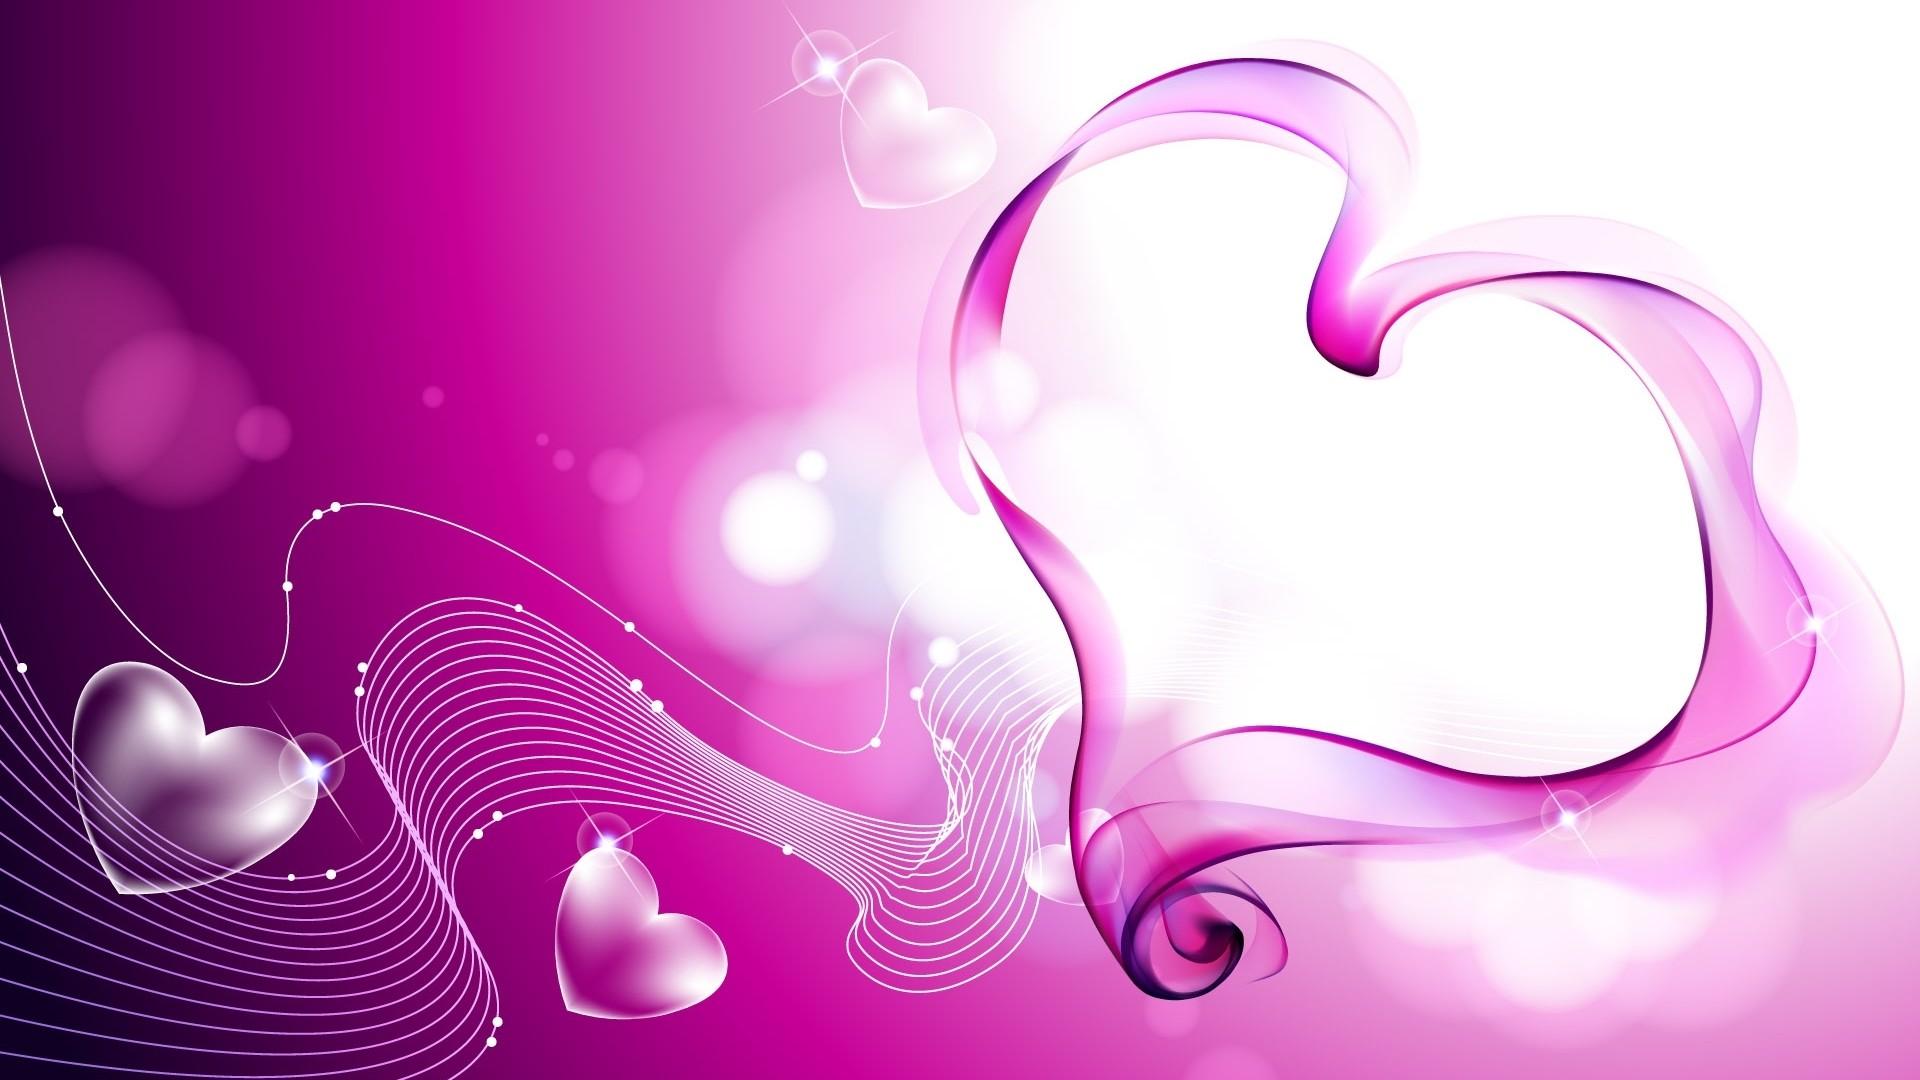 Love wallpaper for pc